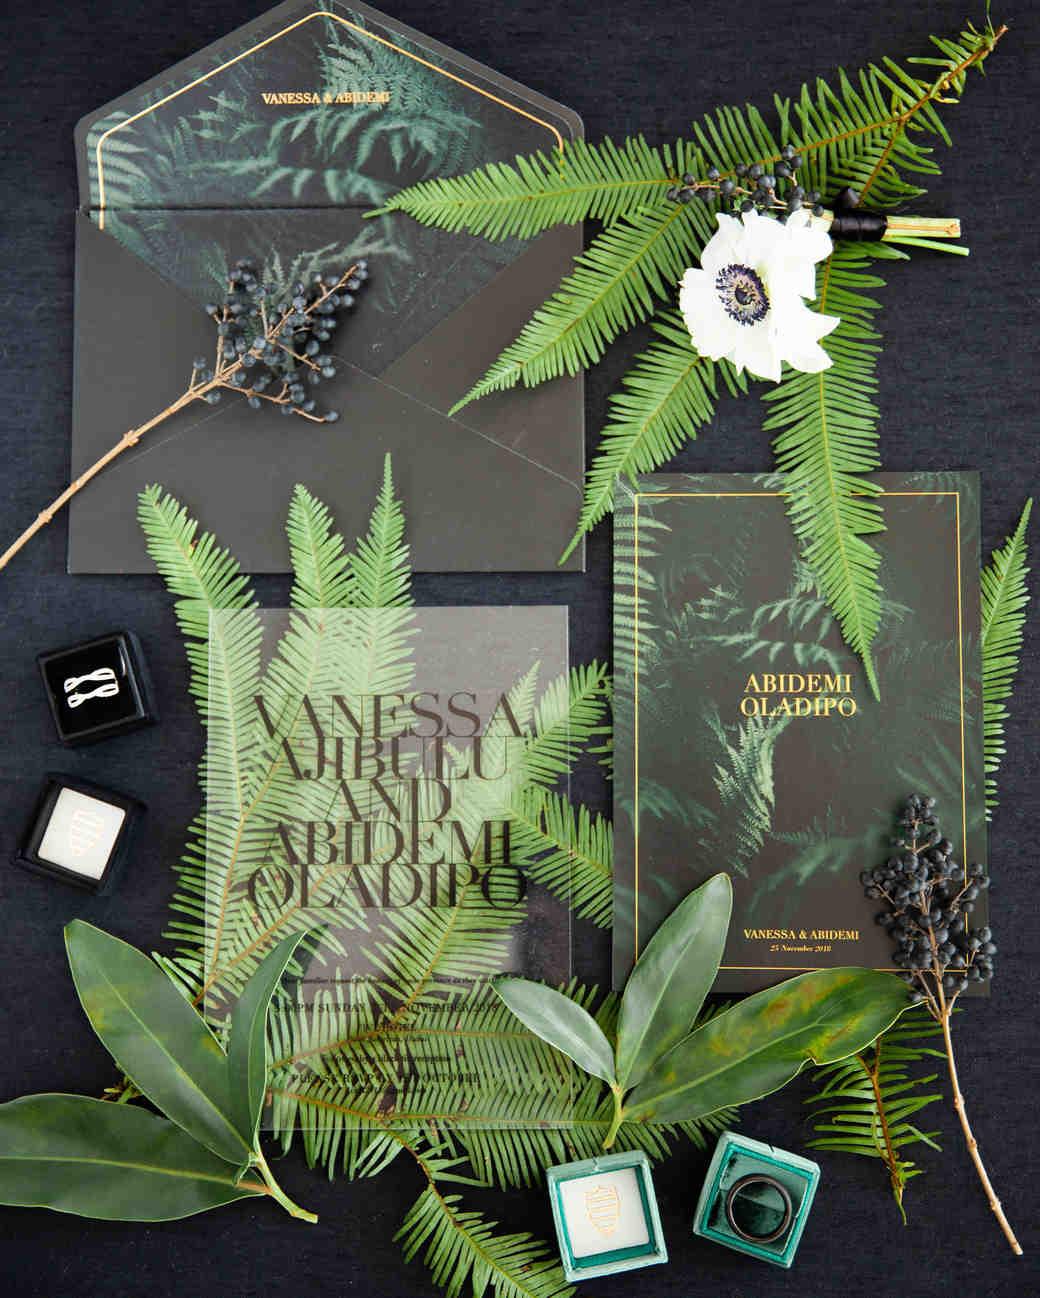 vanessa abidemi wedding palm brand and black invitations